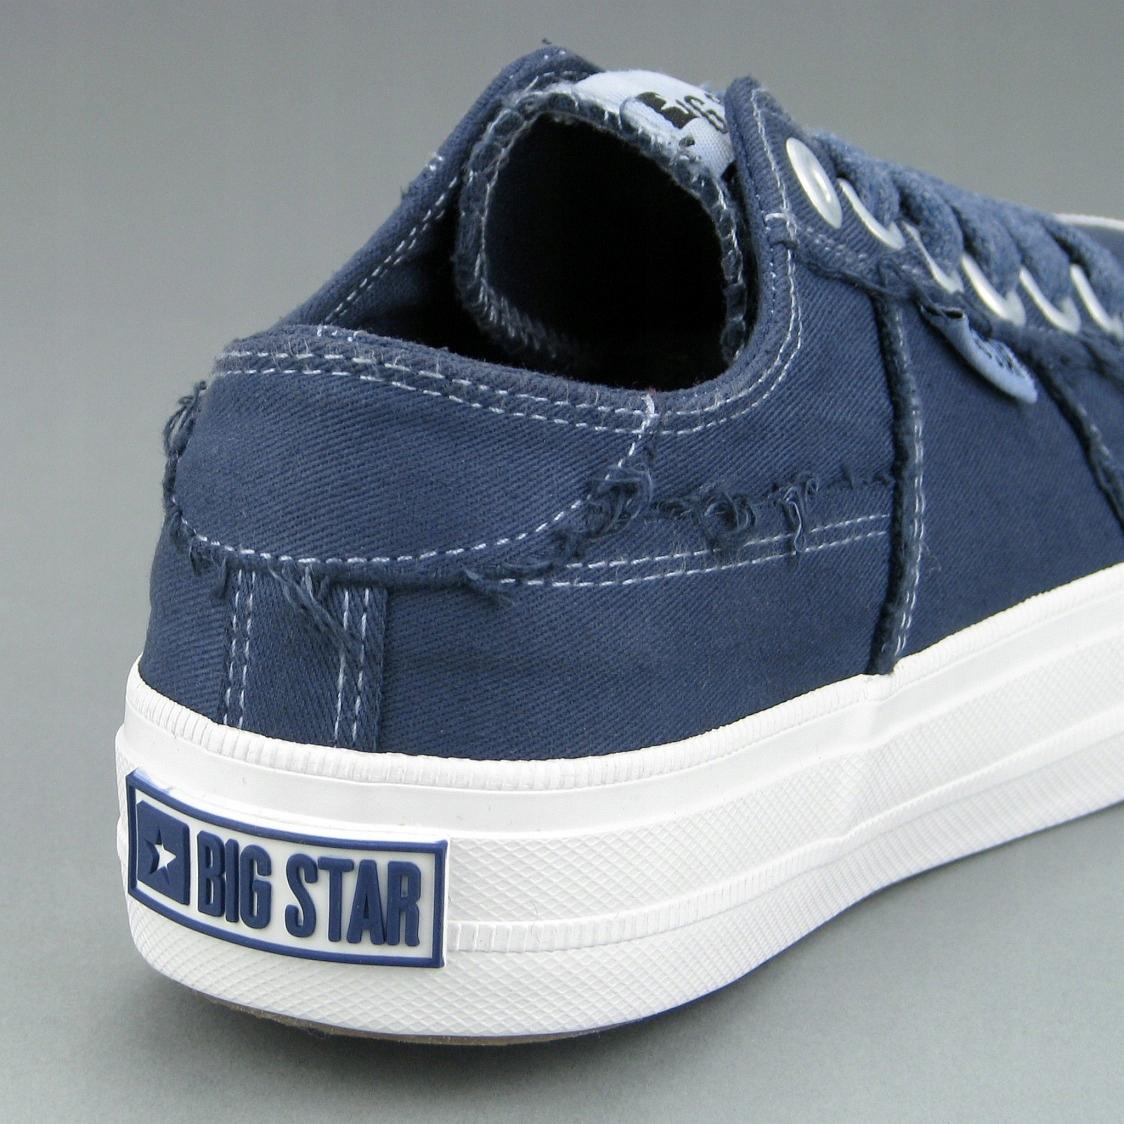 TRAMPKI damskie buty BIG STAR DD274448 38